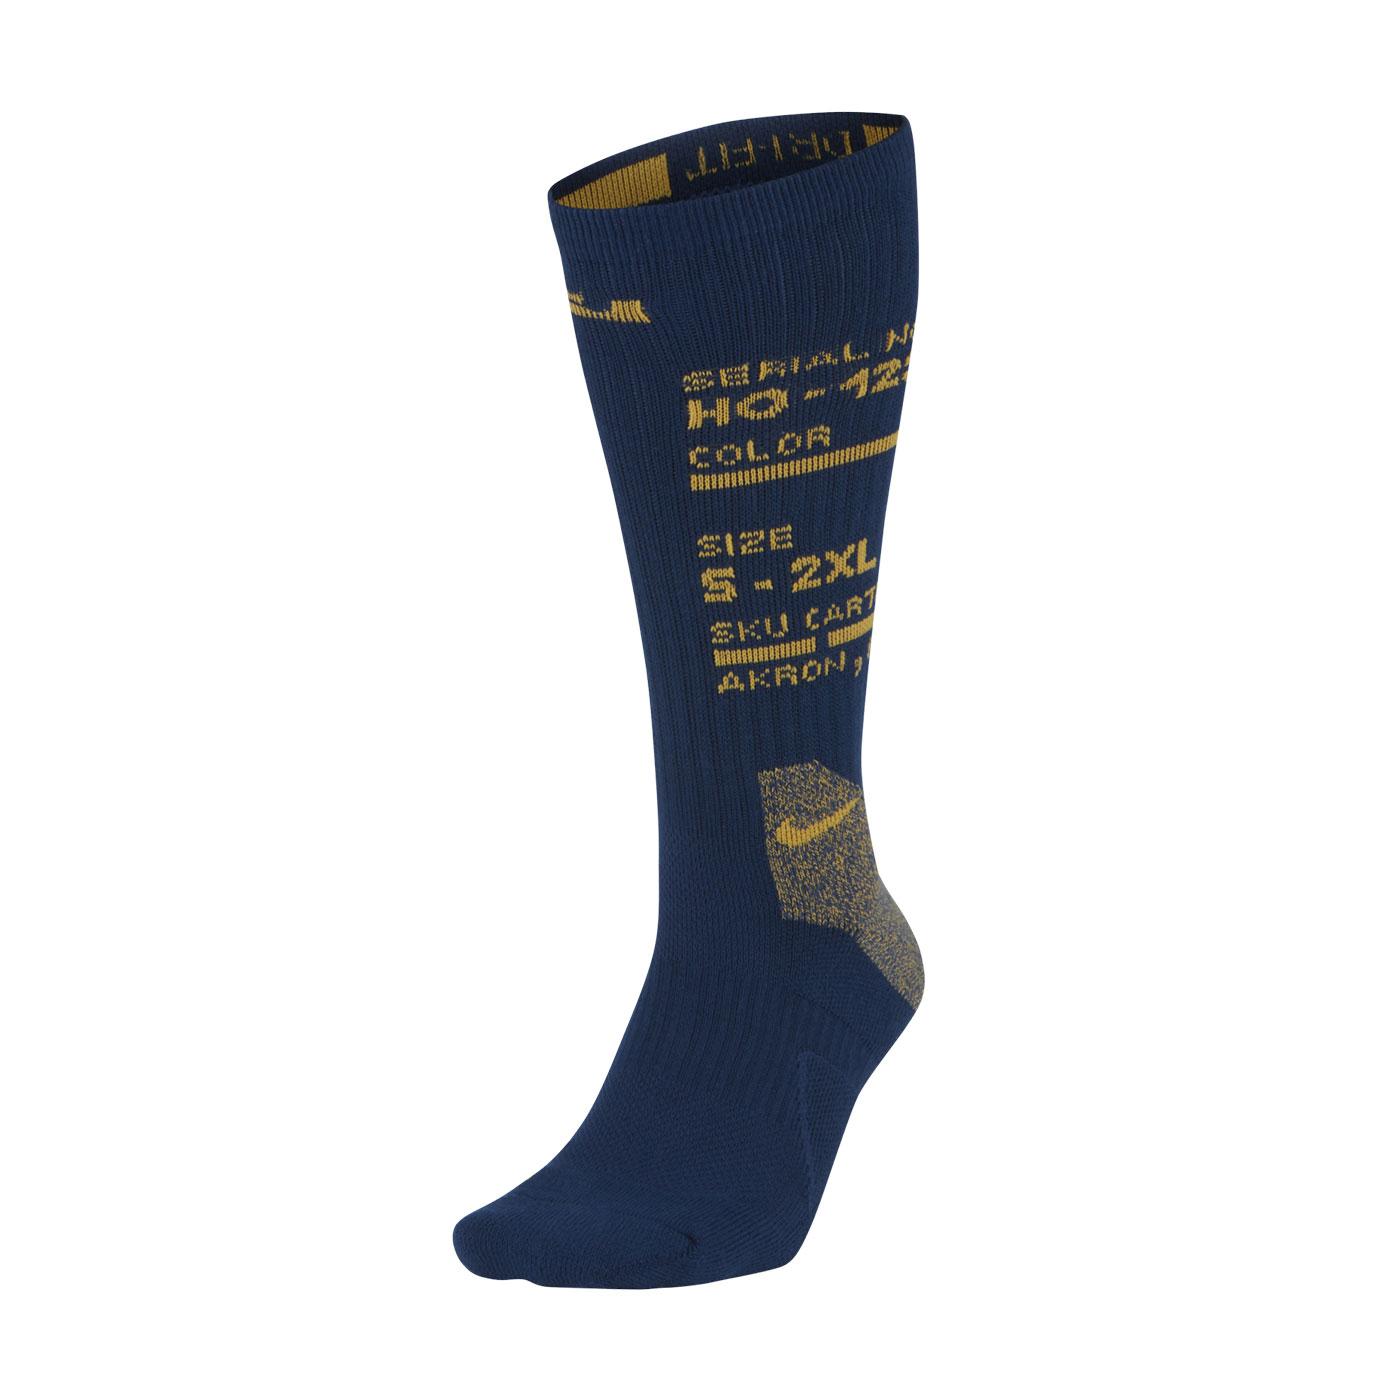 NIKE 中筒籃球襪 CK6784-490 - 深藍黃